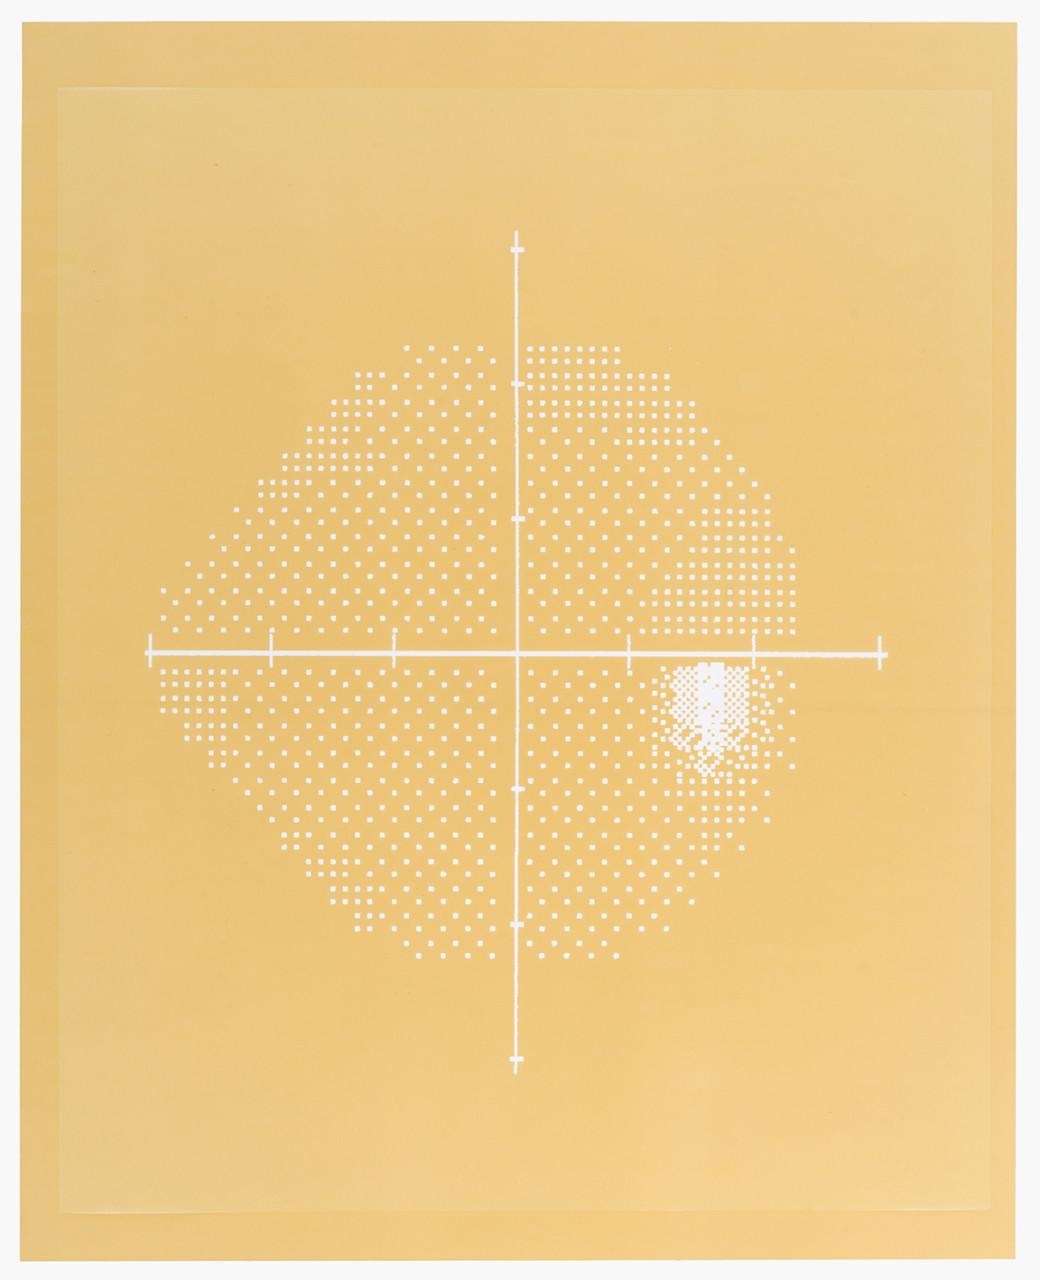 Visual field (Pail yolk yellow)